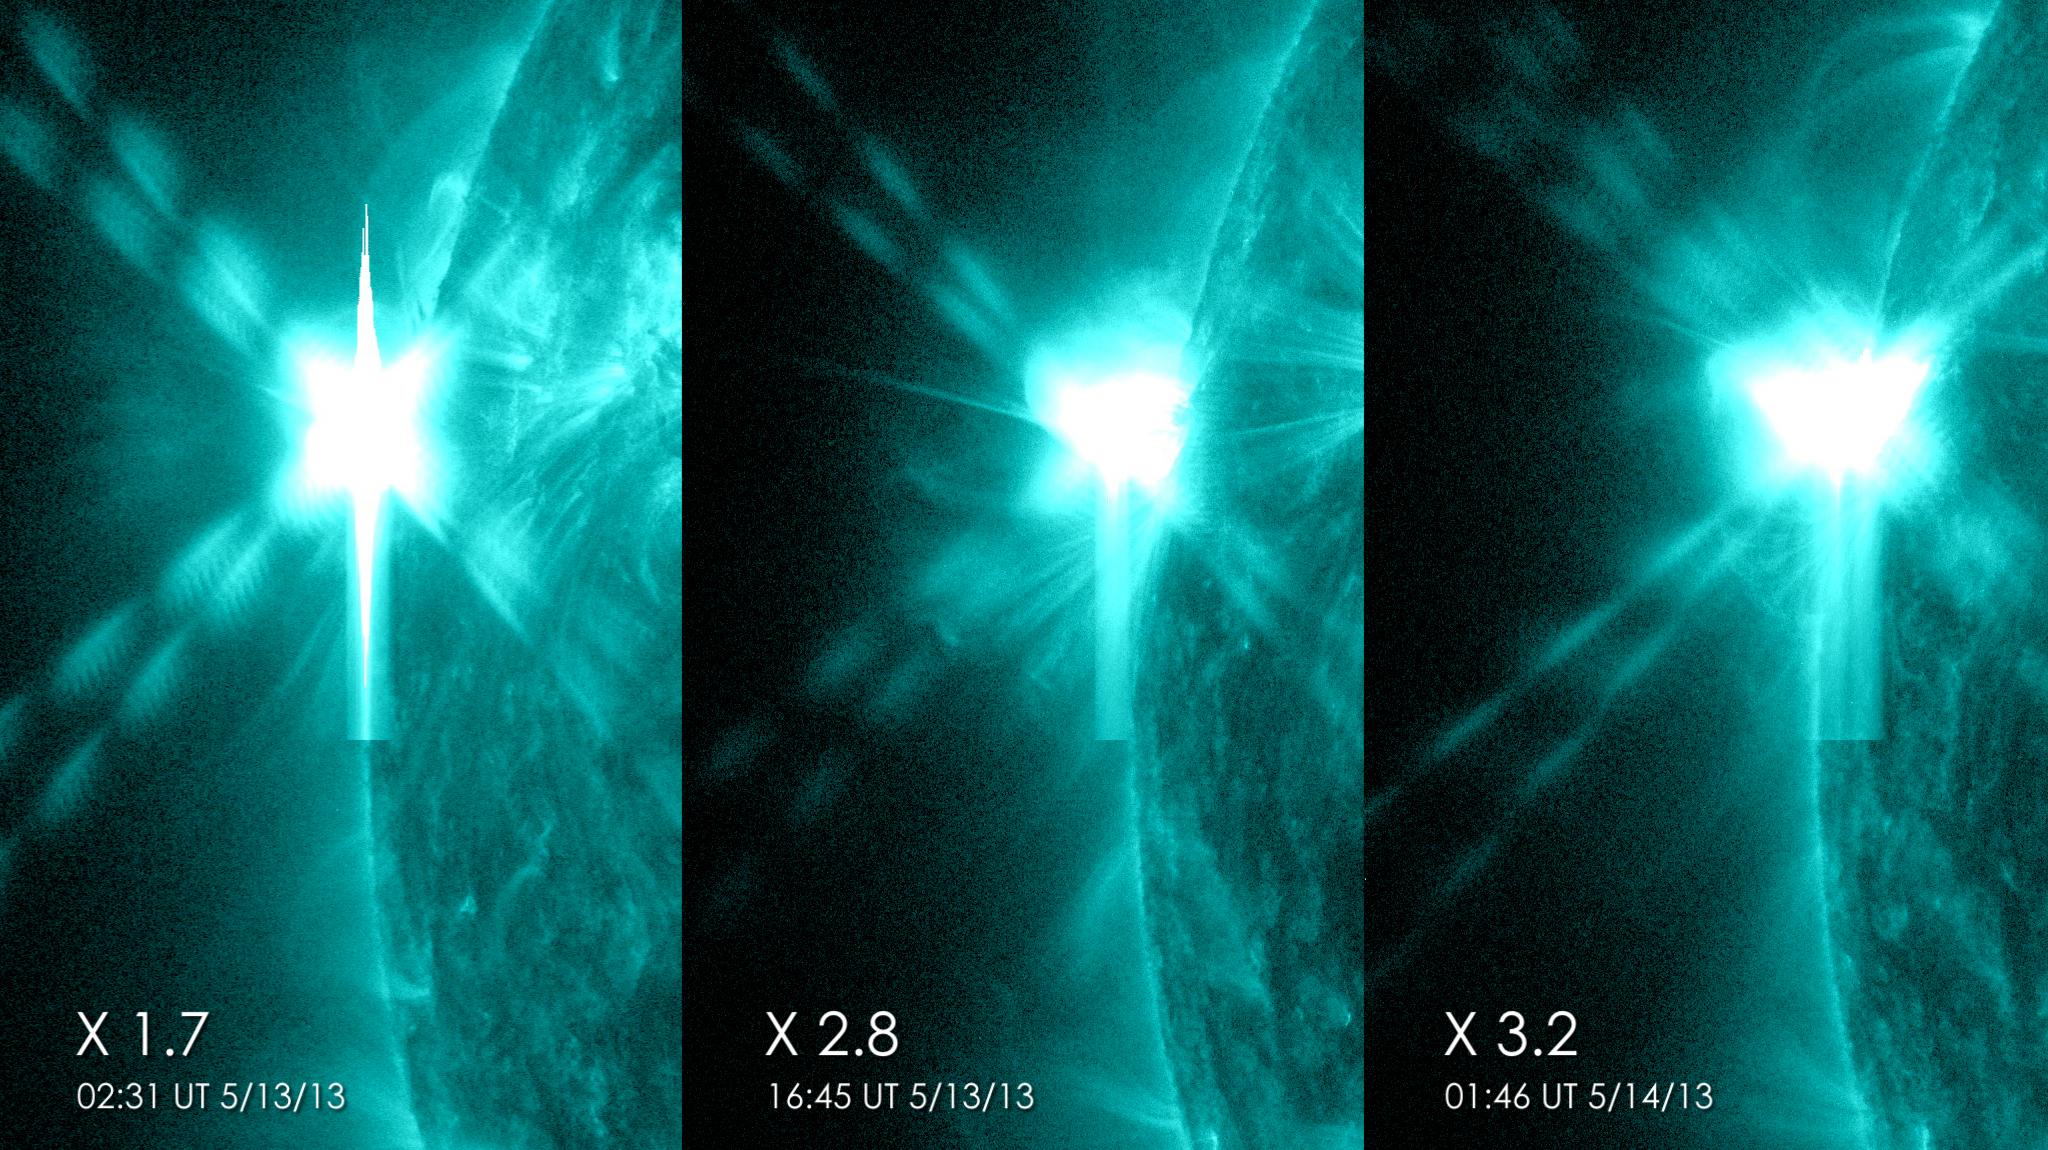 748590main_24_Hours_3_X_Flares.jpg